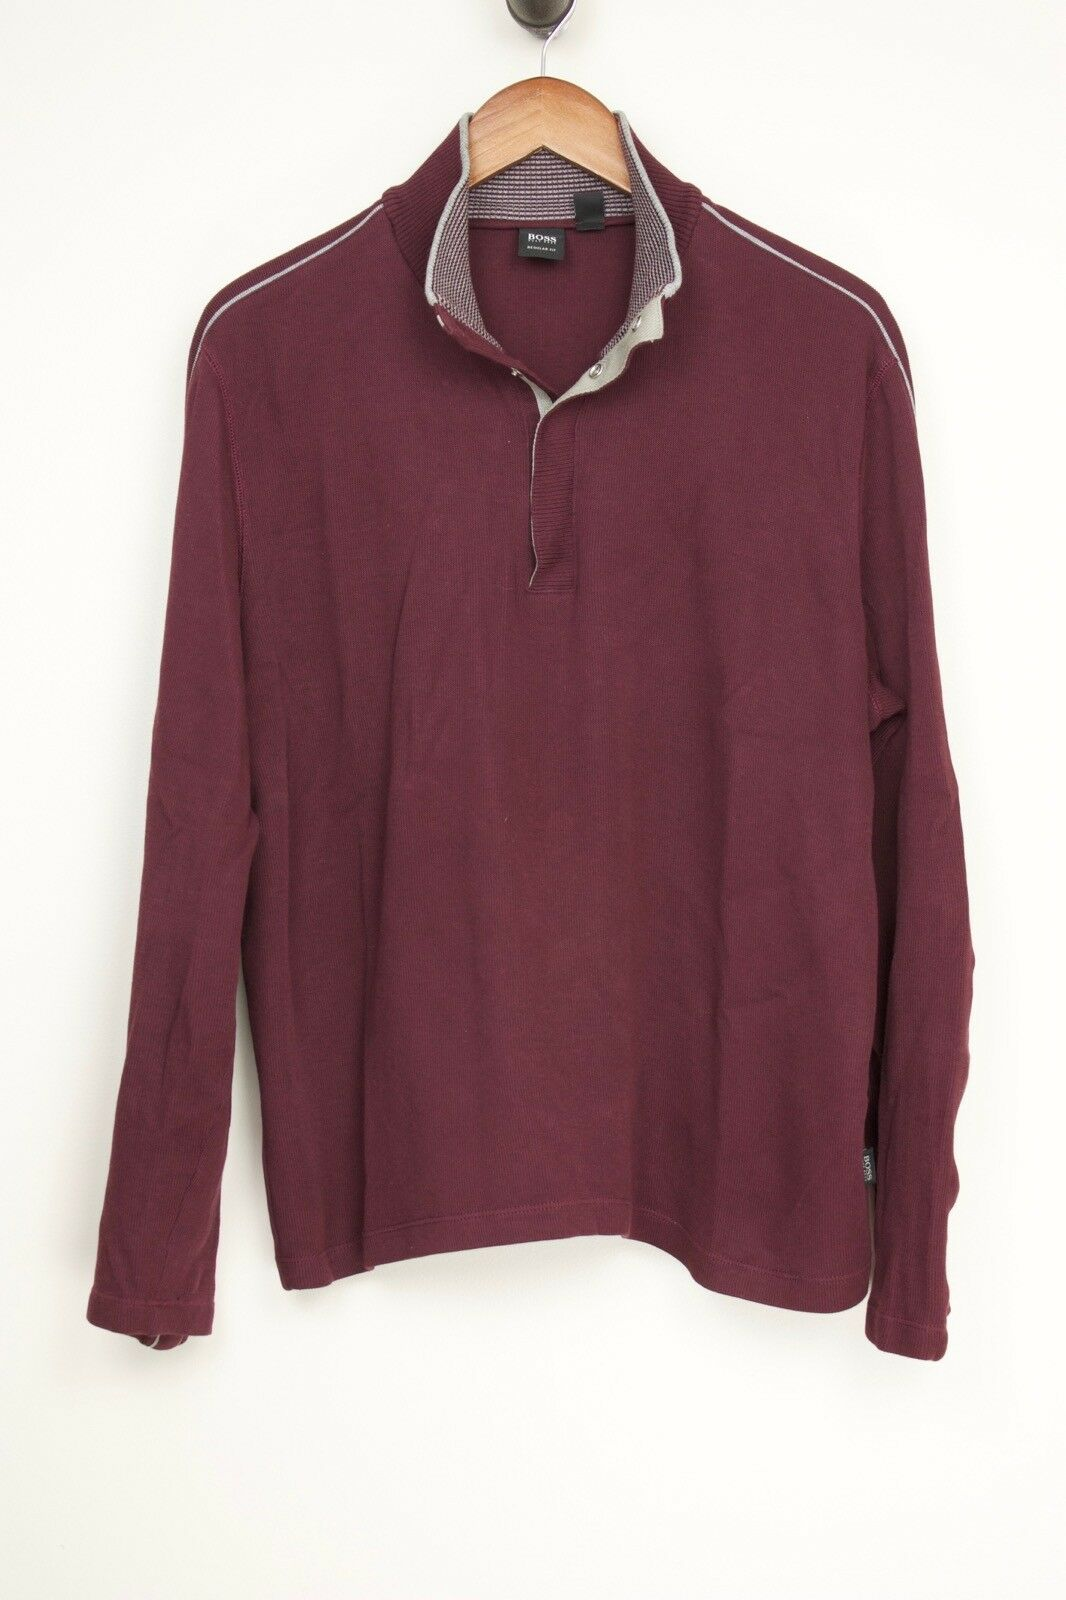 Hugo Boss Piceno  Herren Sweater L Burgundy grau Stripe Button Collar Long Sleeve